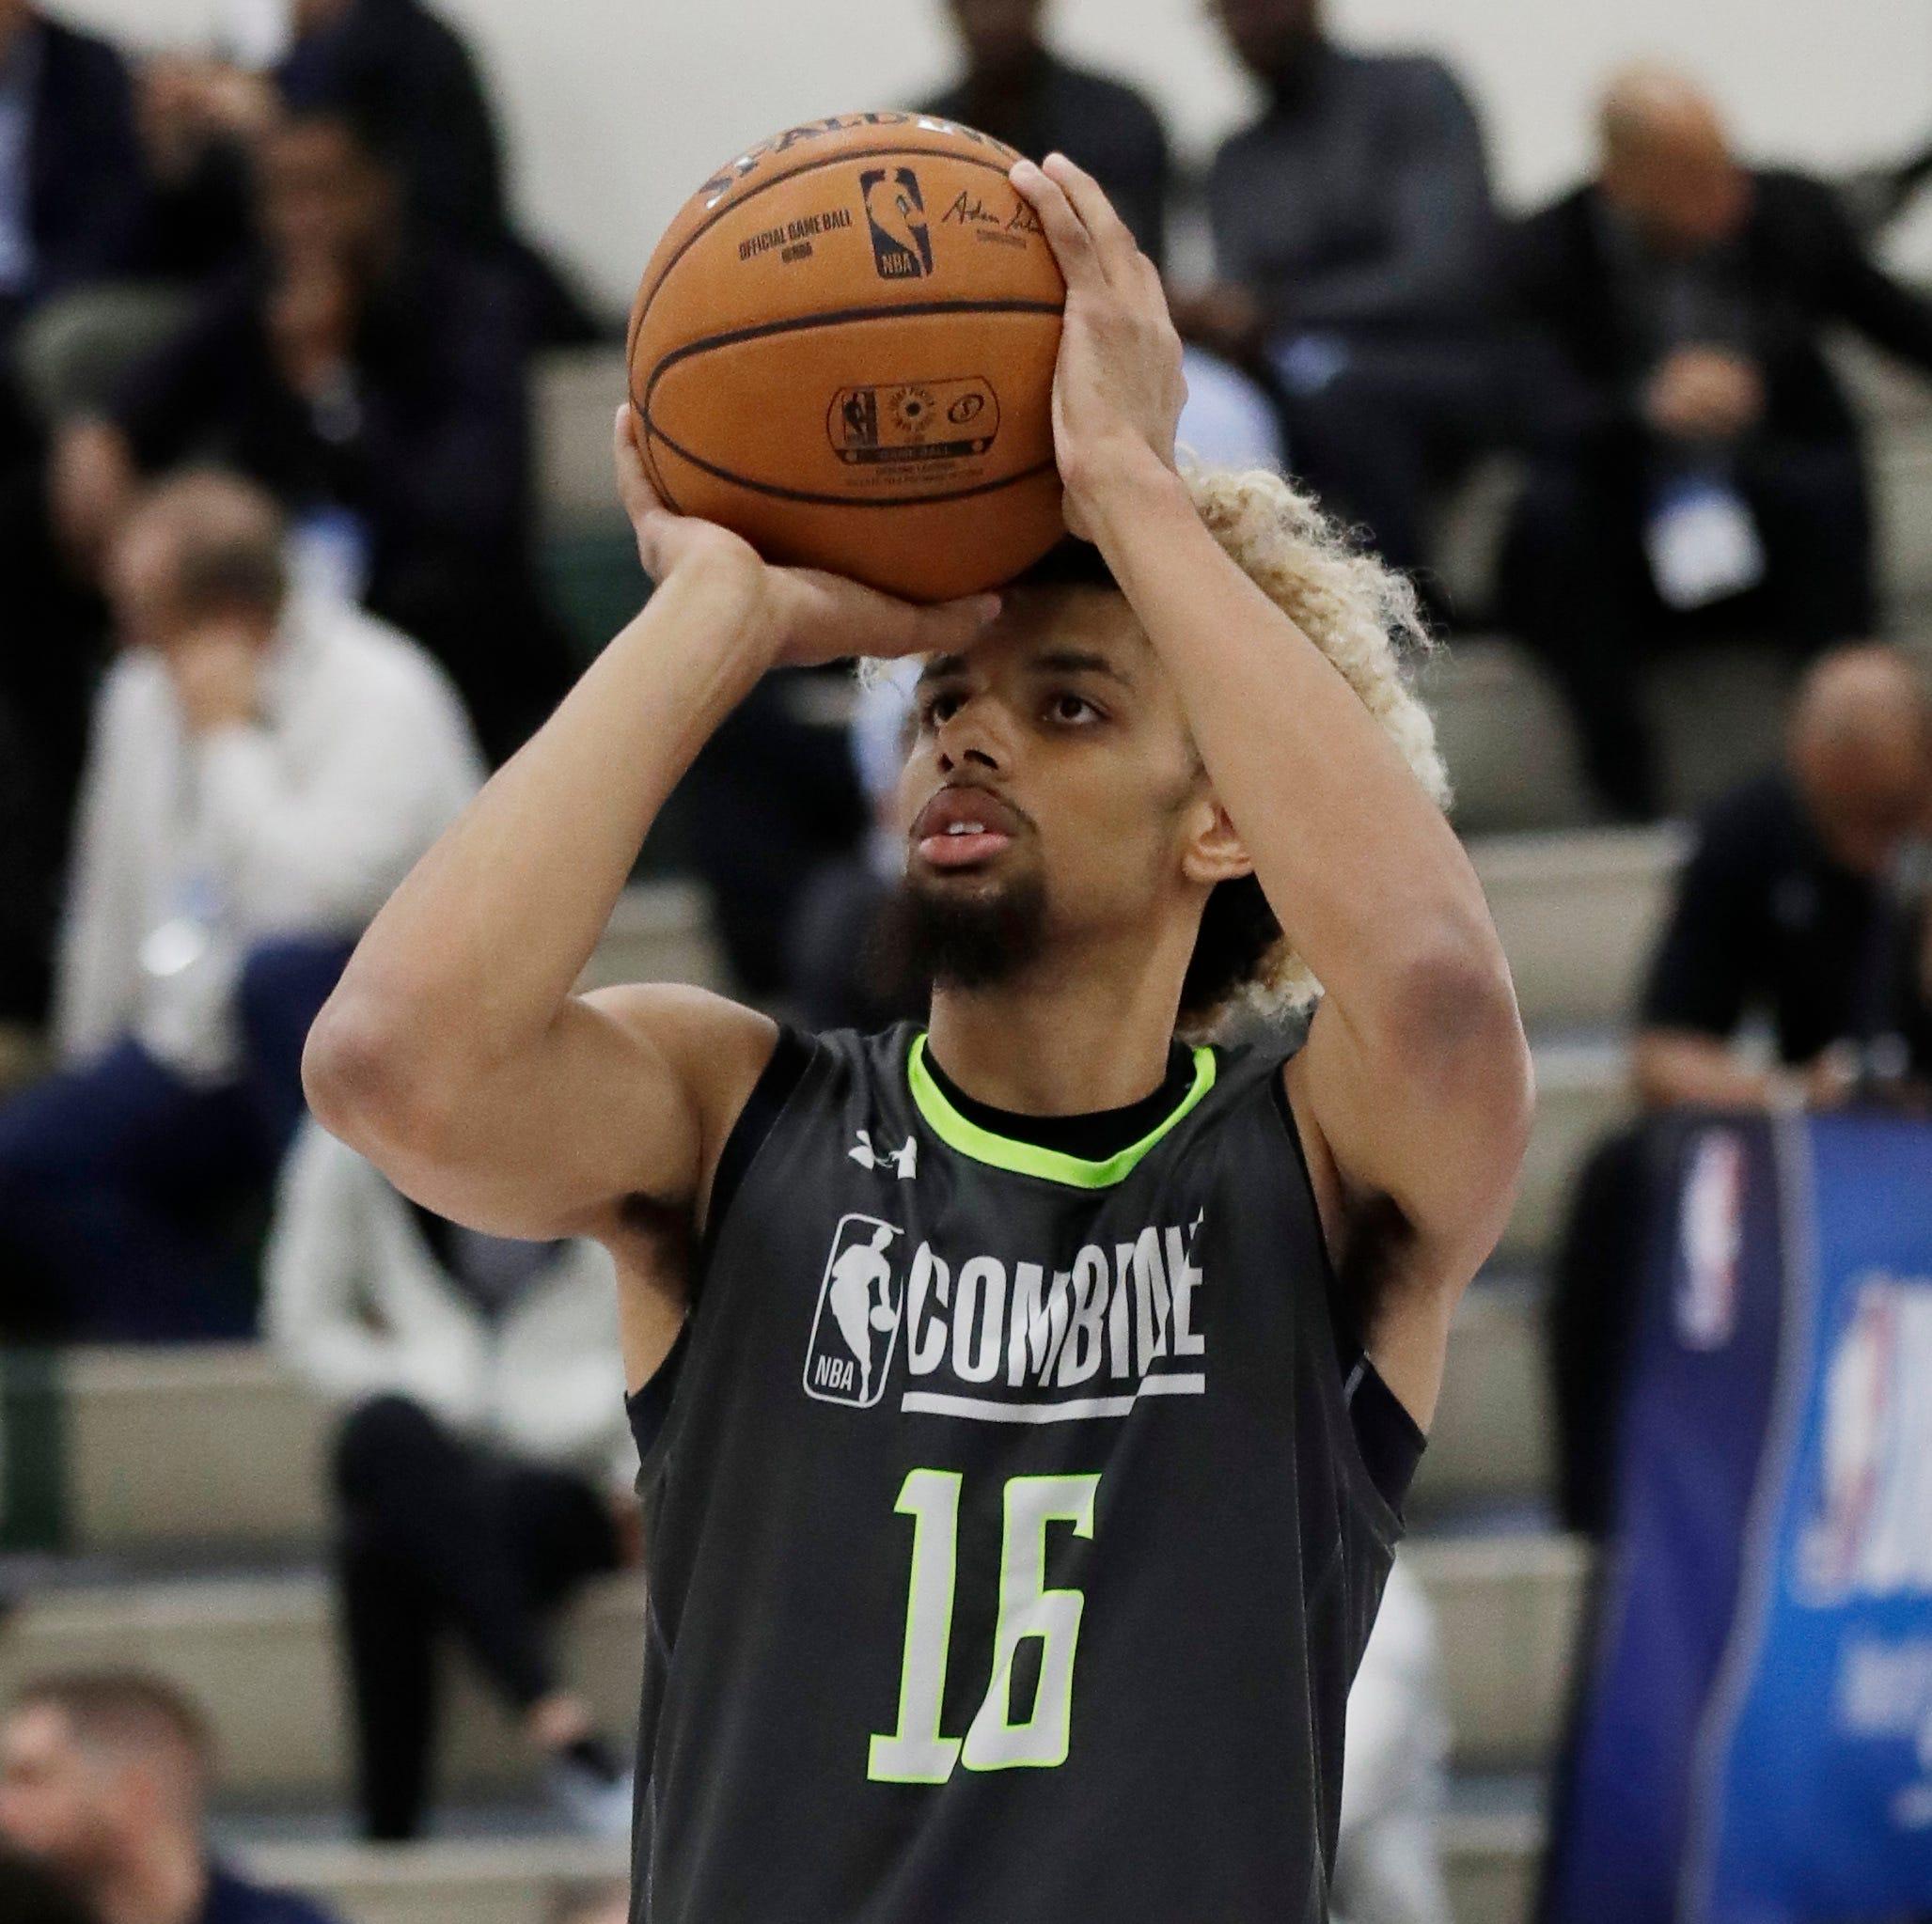 After detours, Saginaw's Brian Bowen hopes to realize NBA dreams